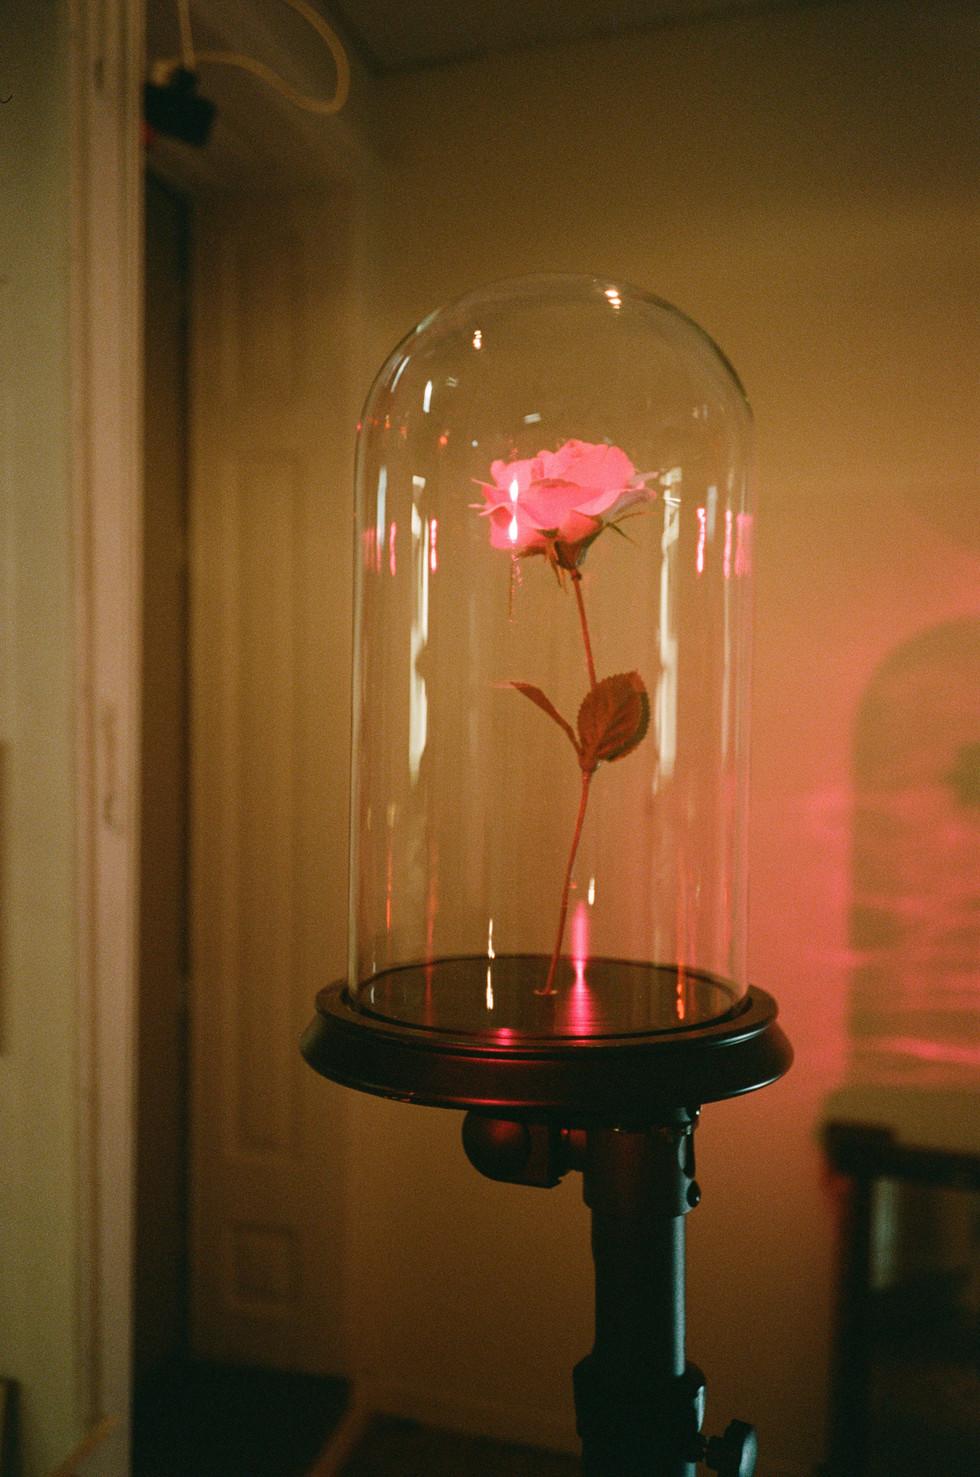 rose-web.jpg